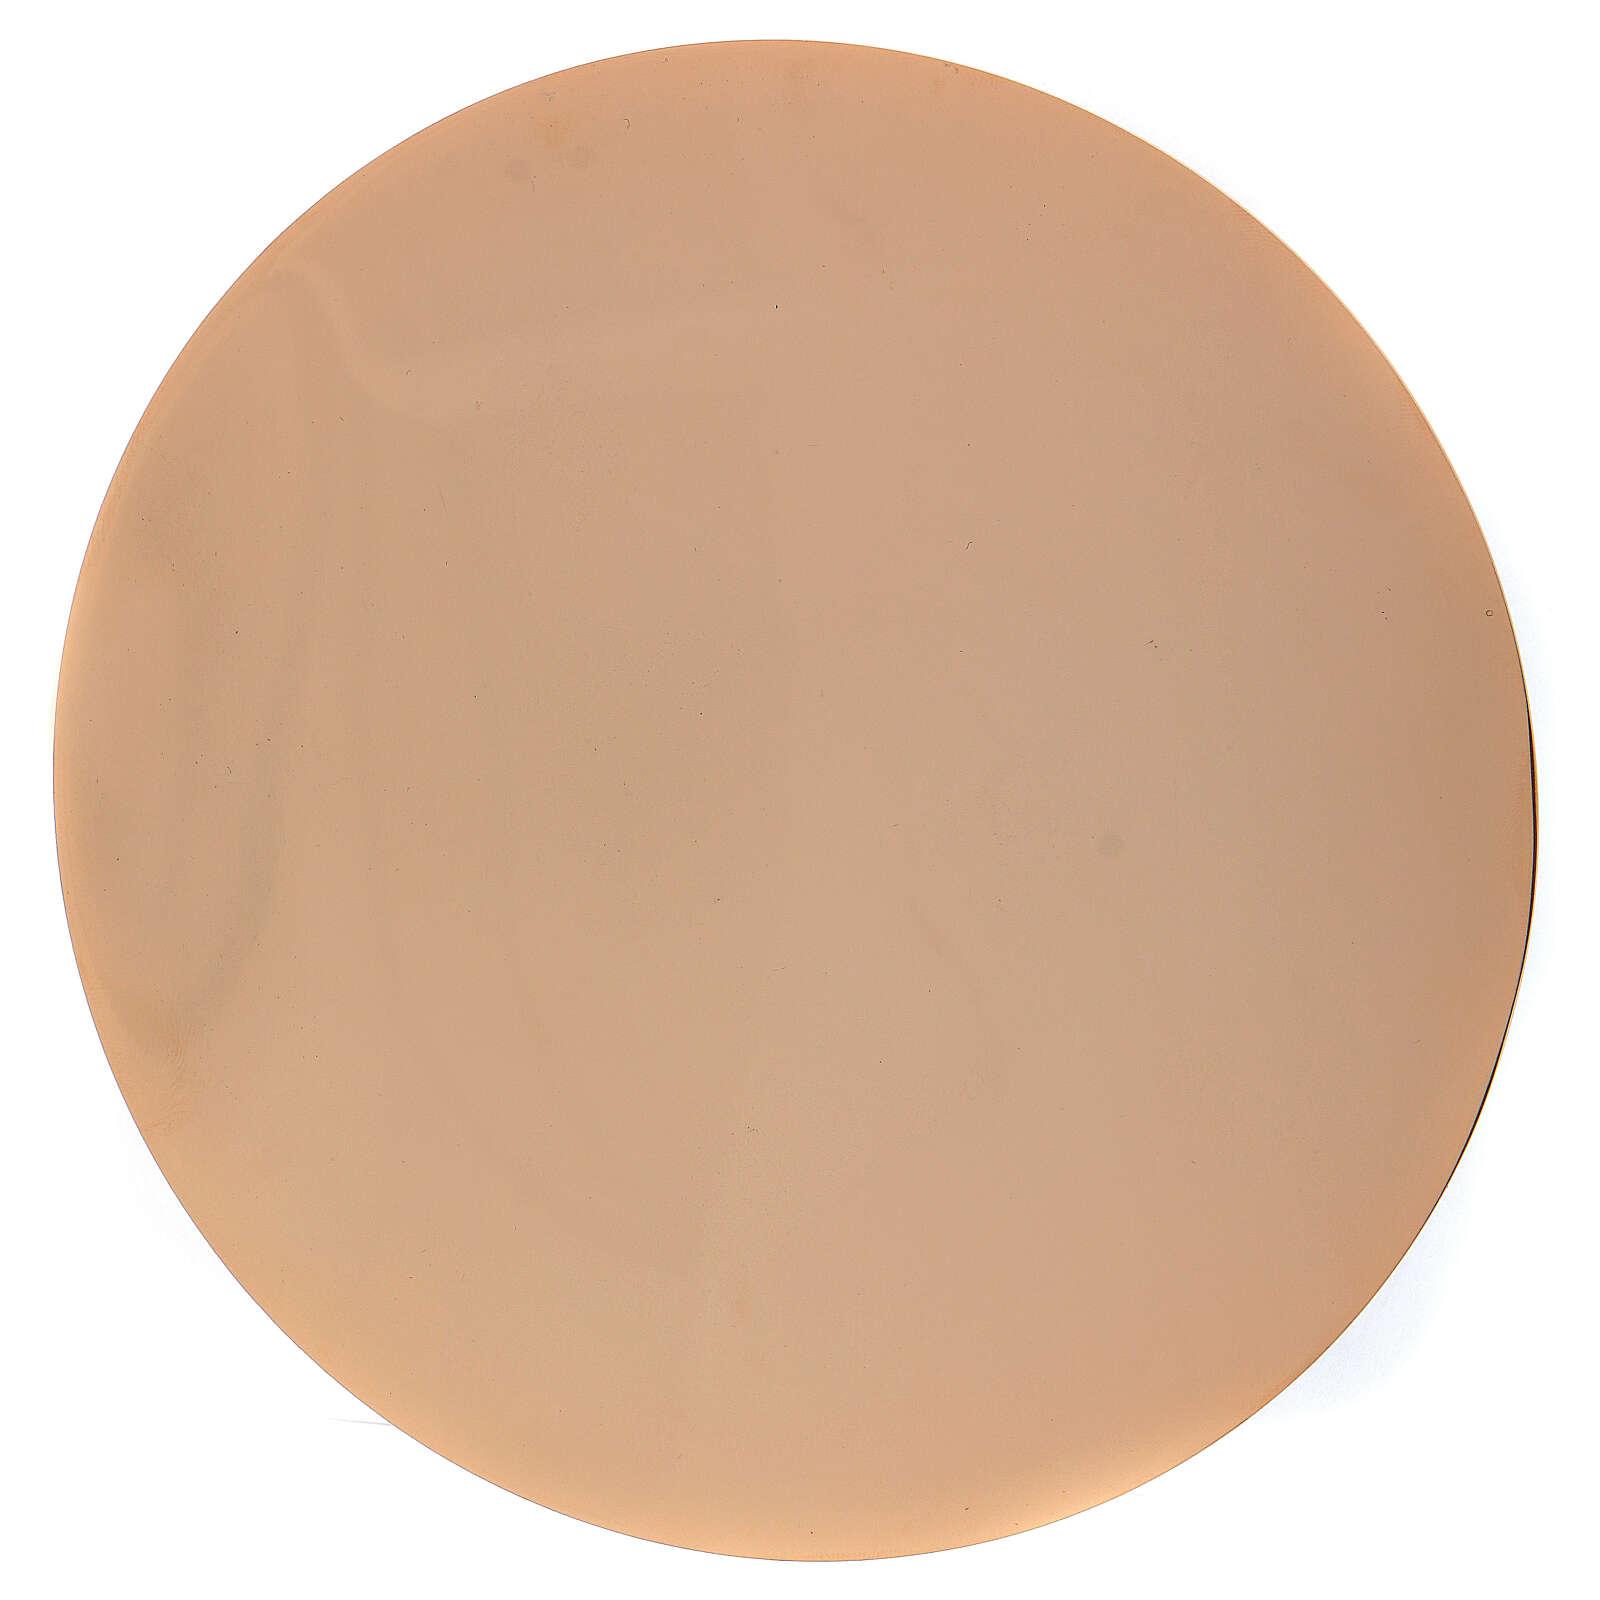 Paten in golden brass with a diameter of 14 cm 4